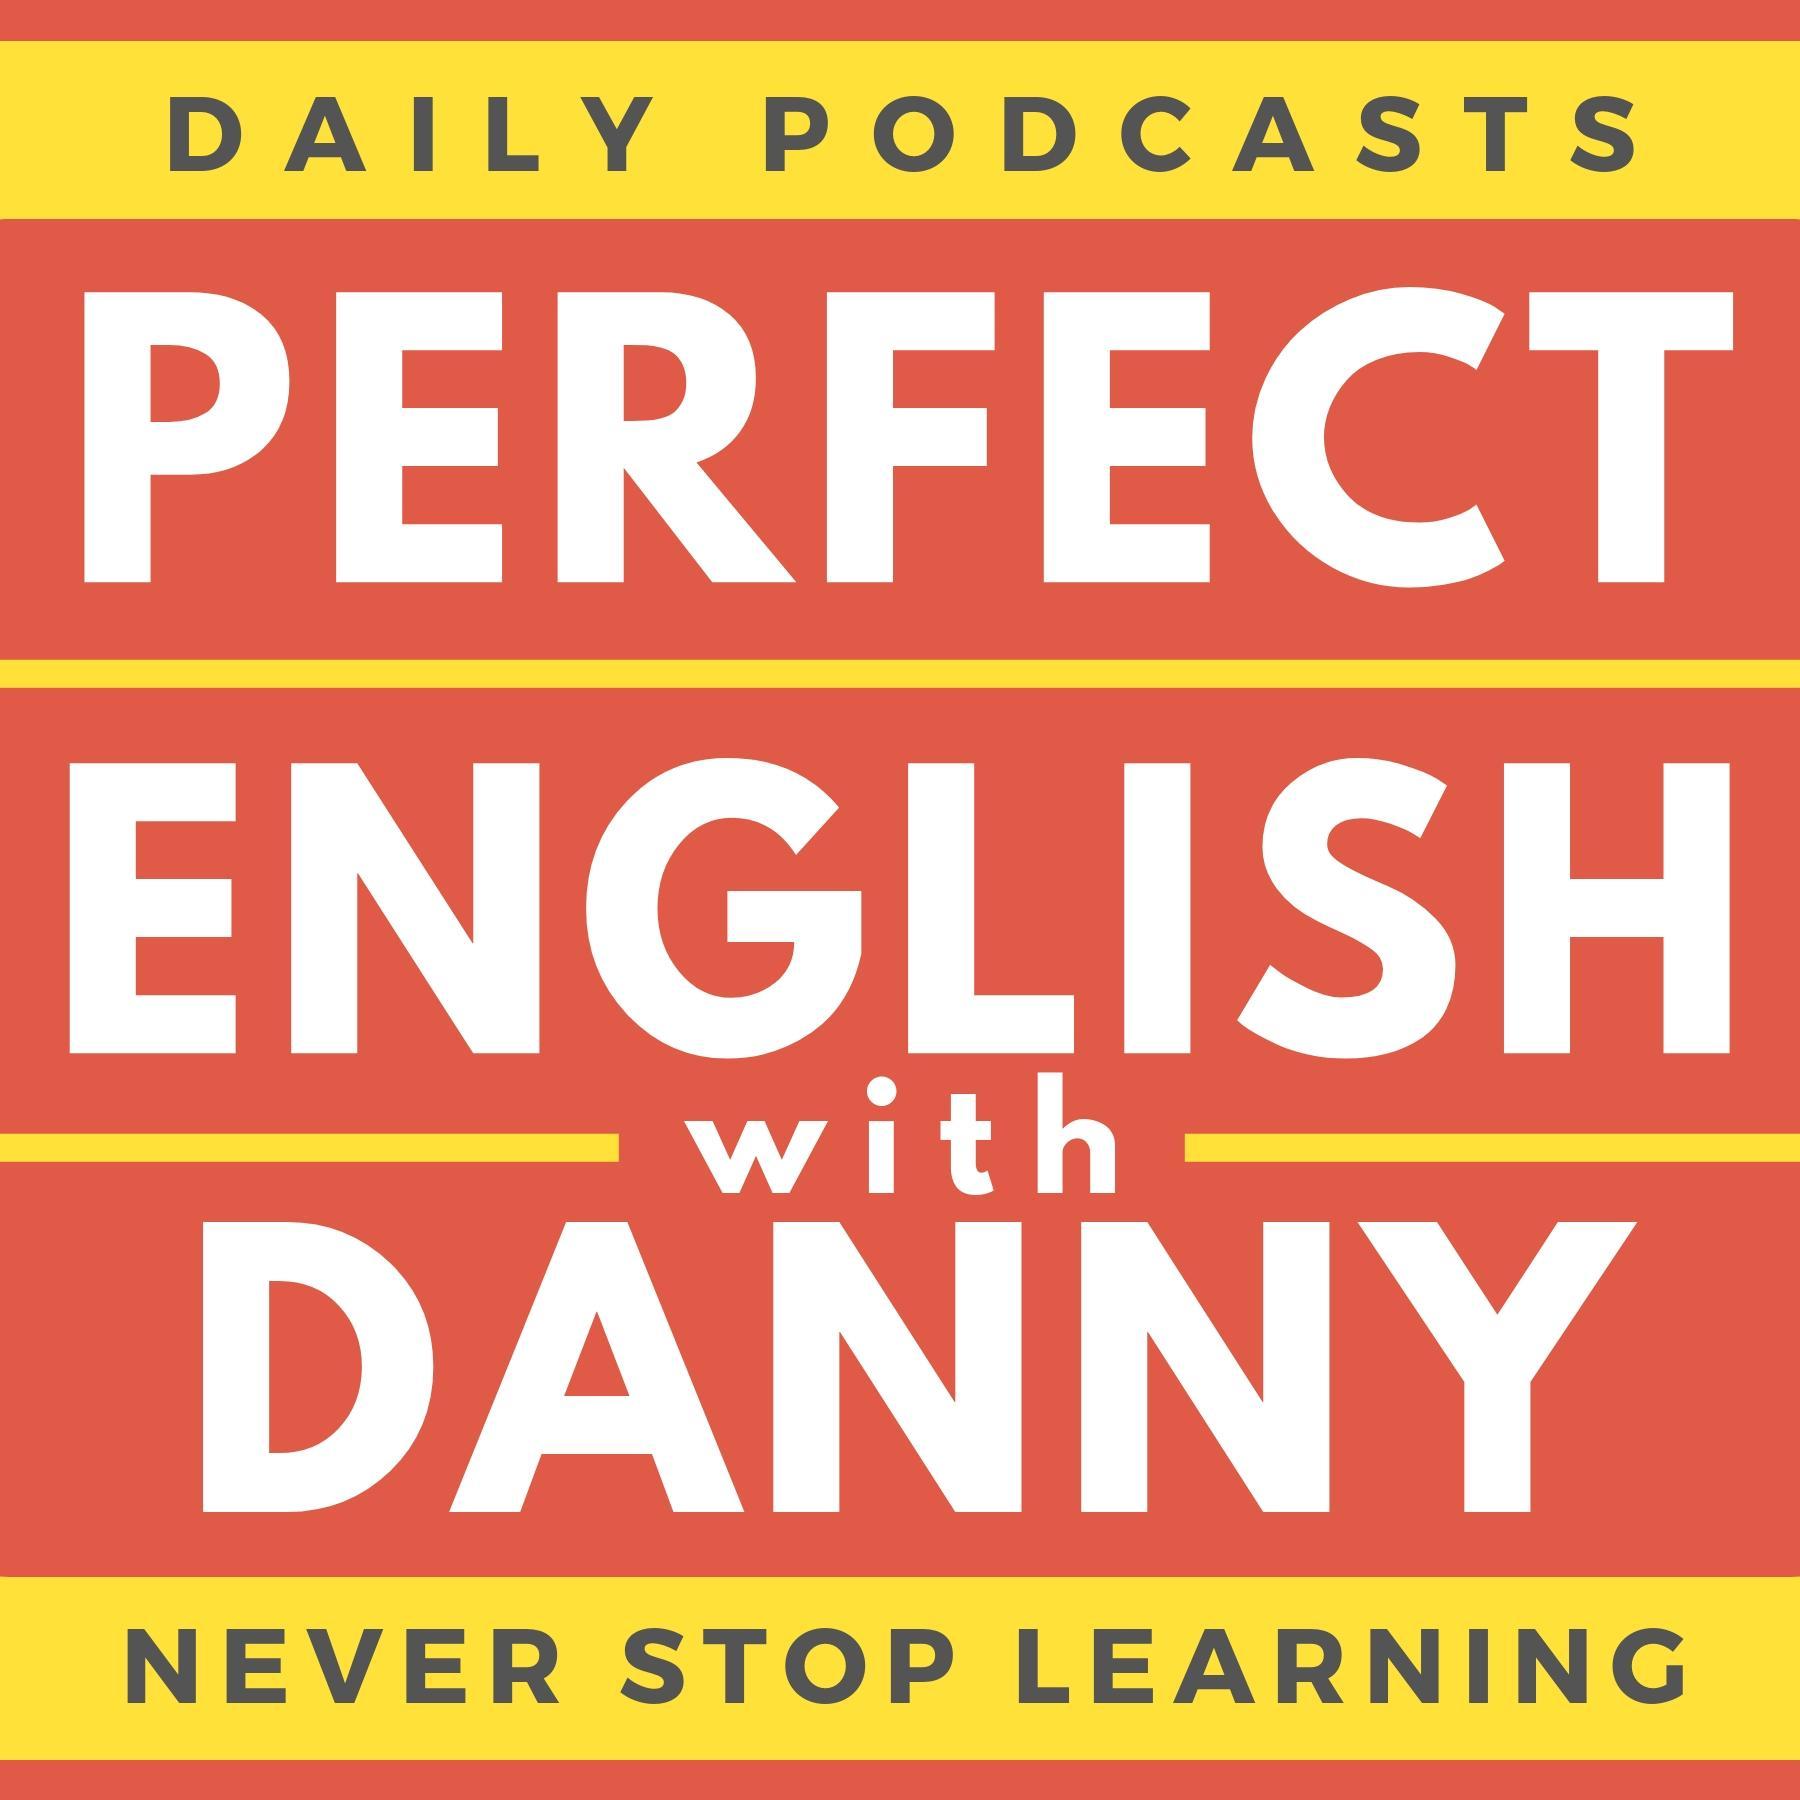 Episode 130 - Vocabulary Builder Week 3-5